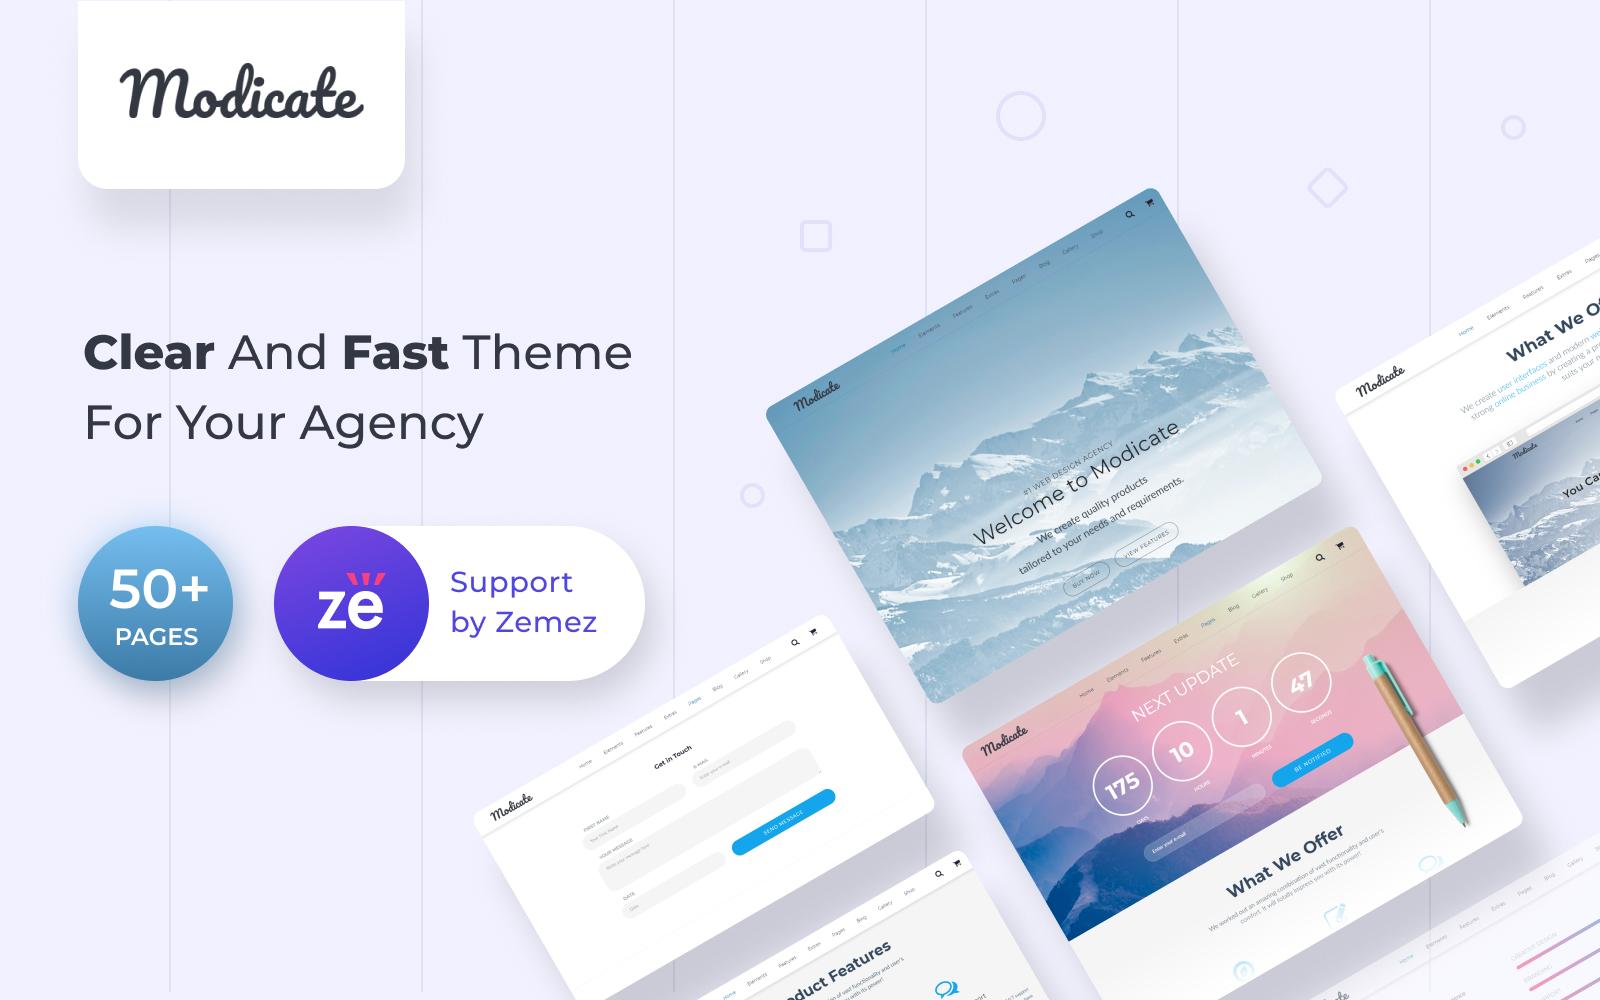 Modicate - Web Design Studio Website Template - screenshot